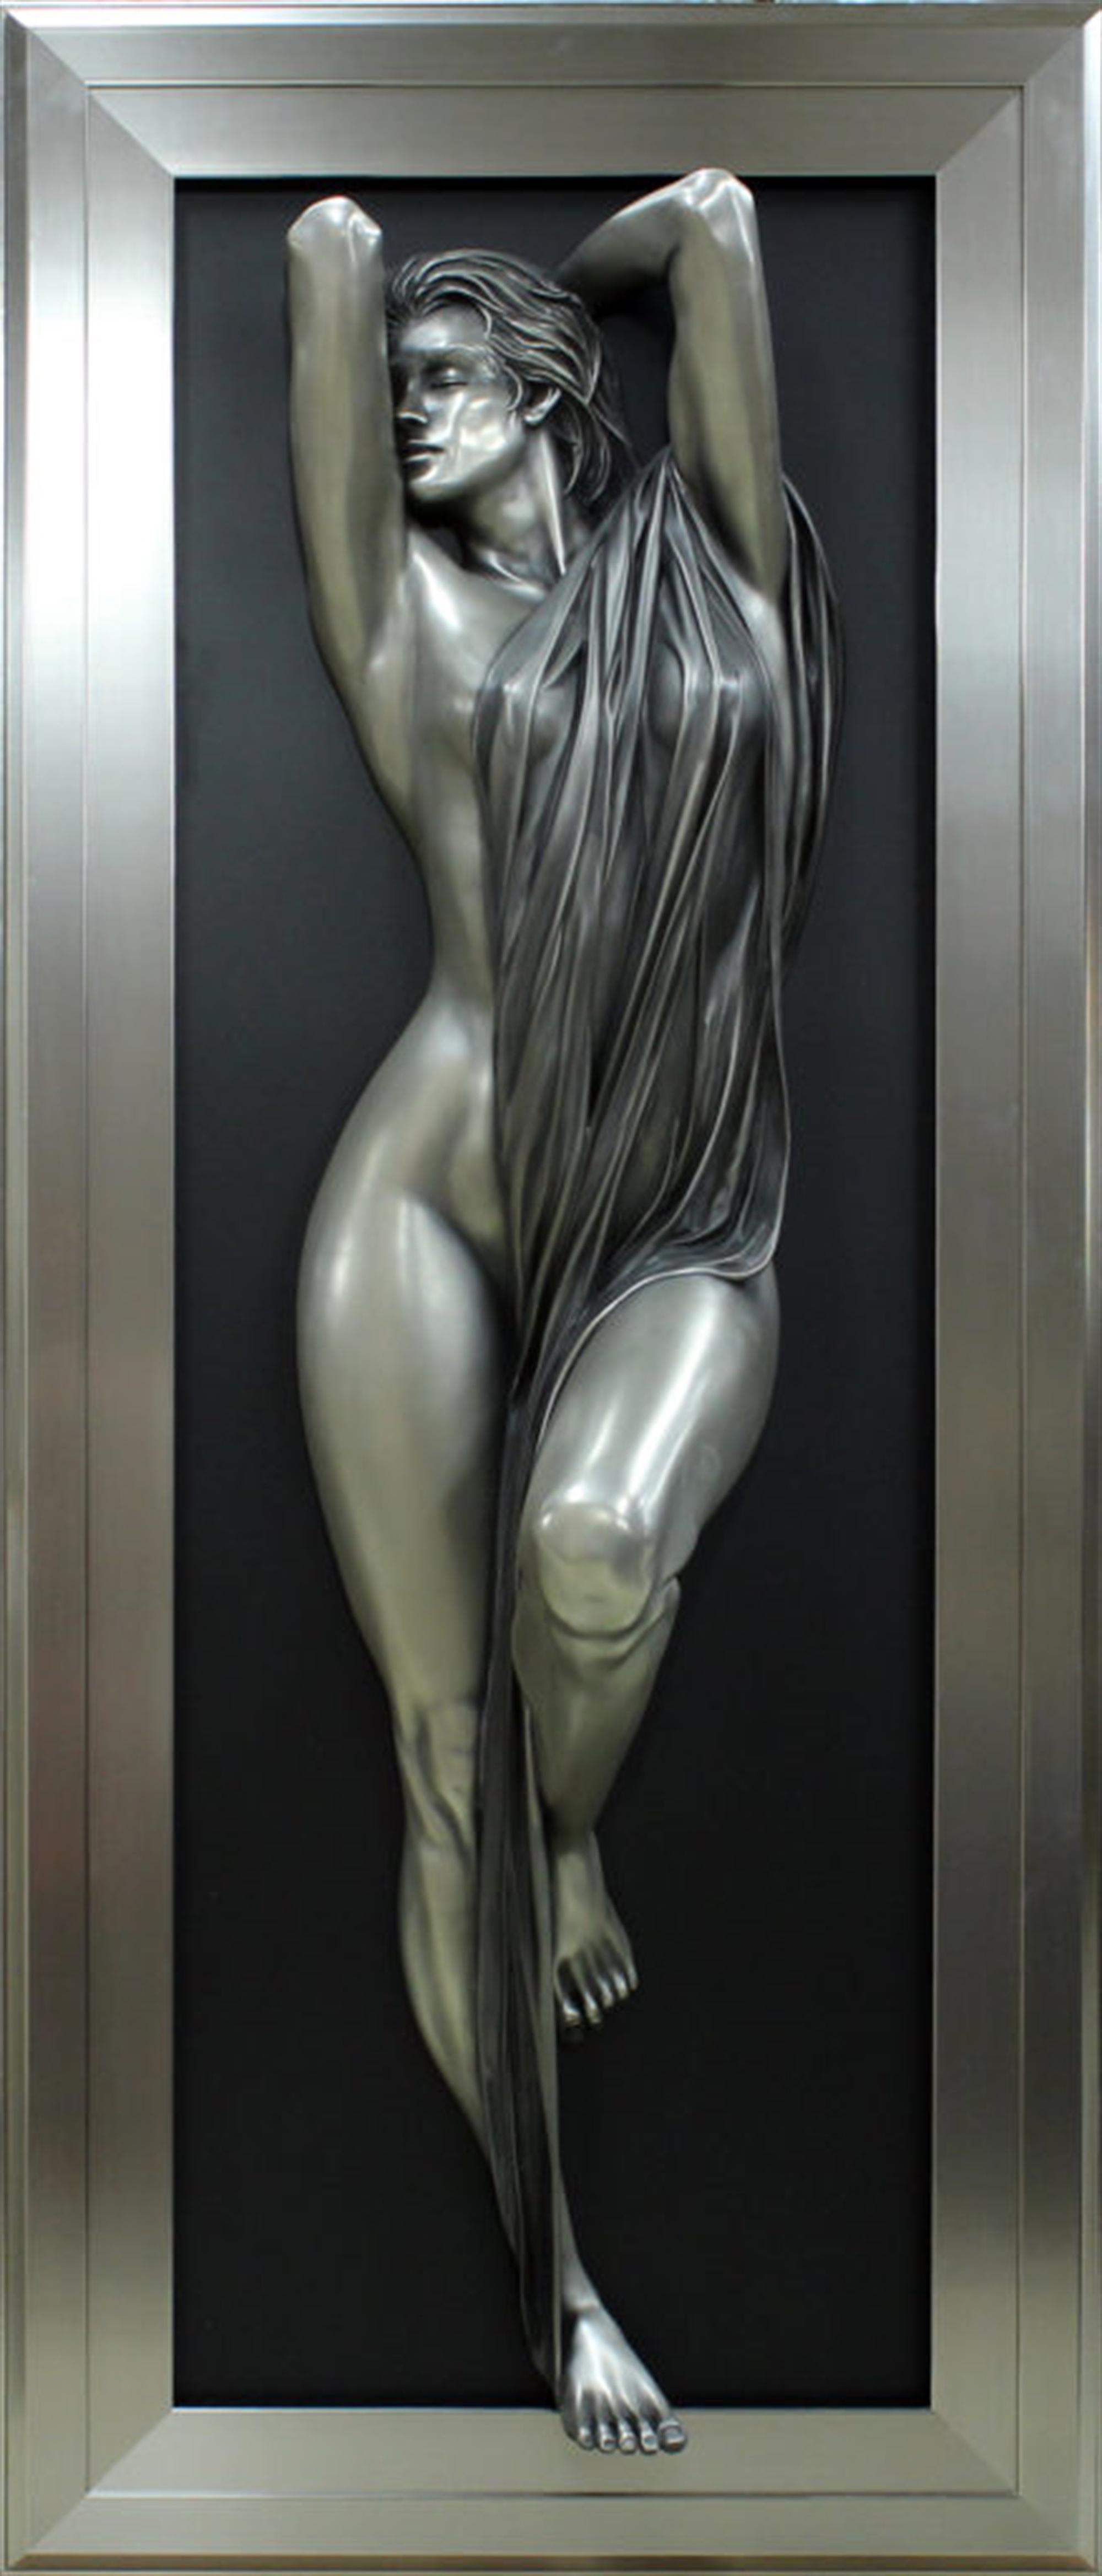 Bather by Bill Mack